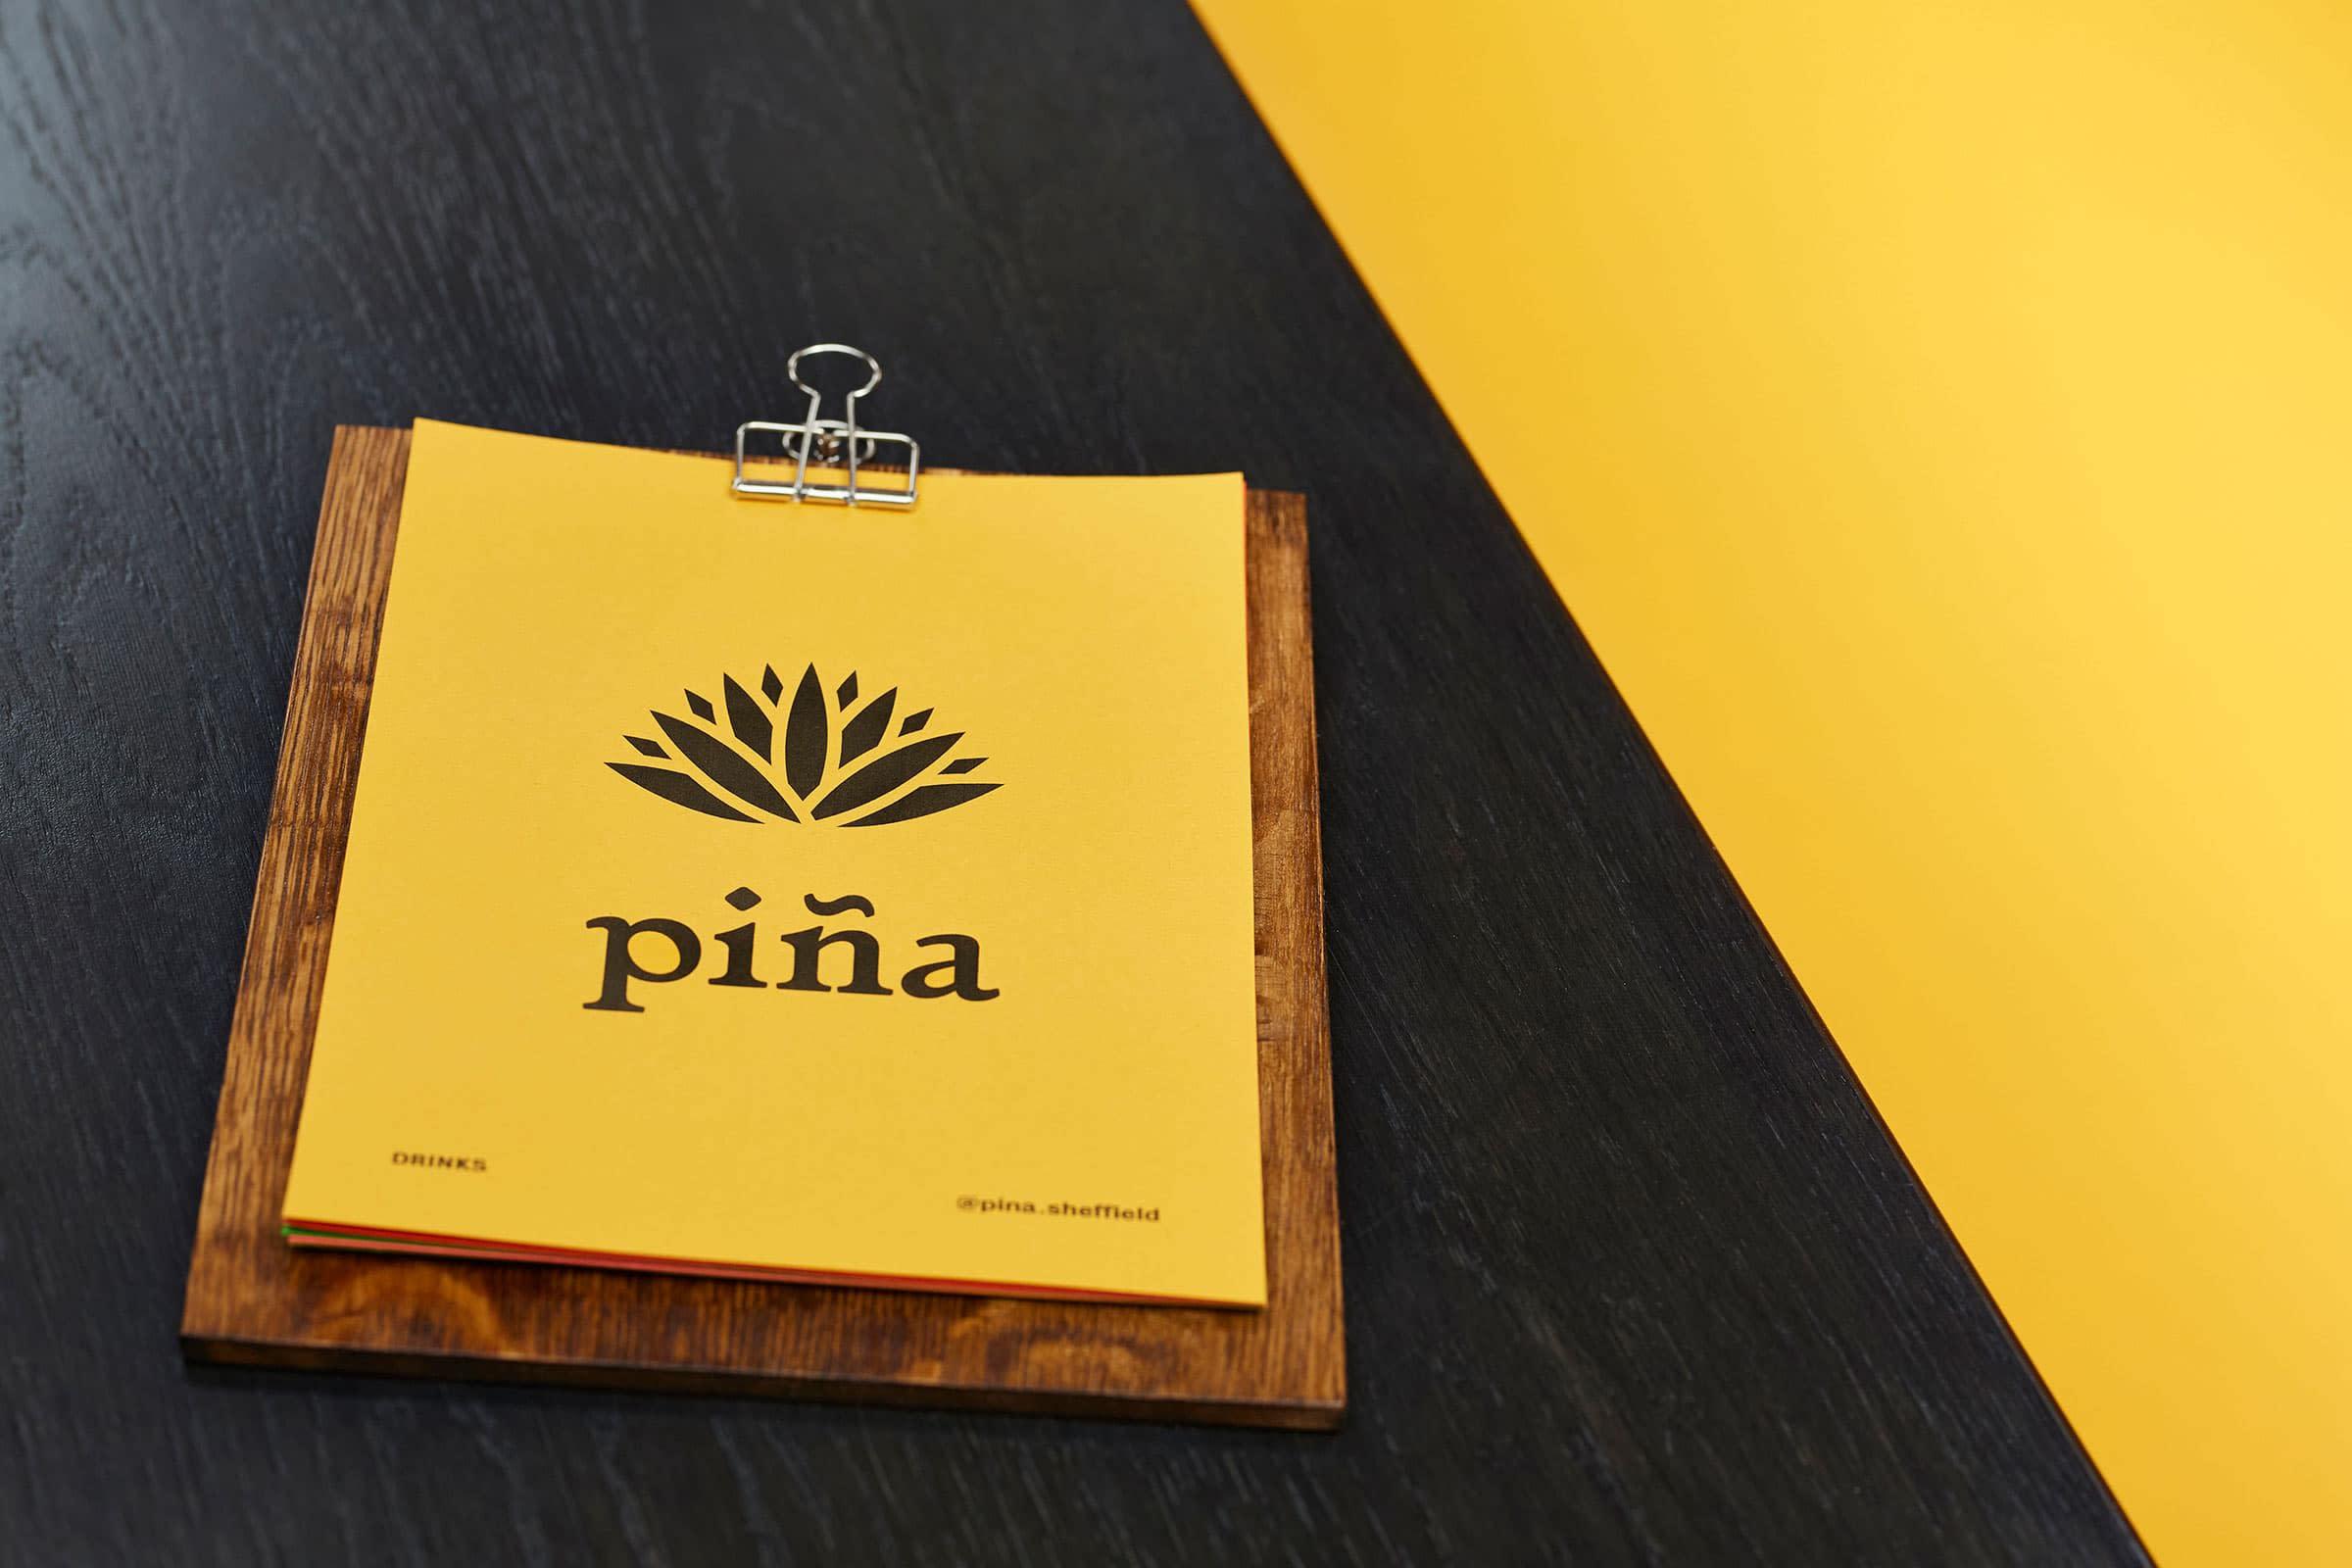 saul studio — piña